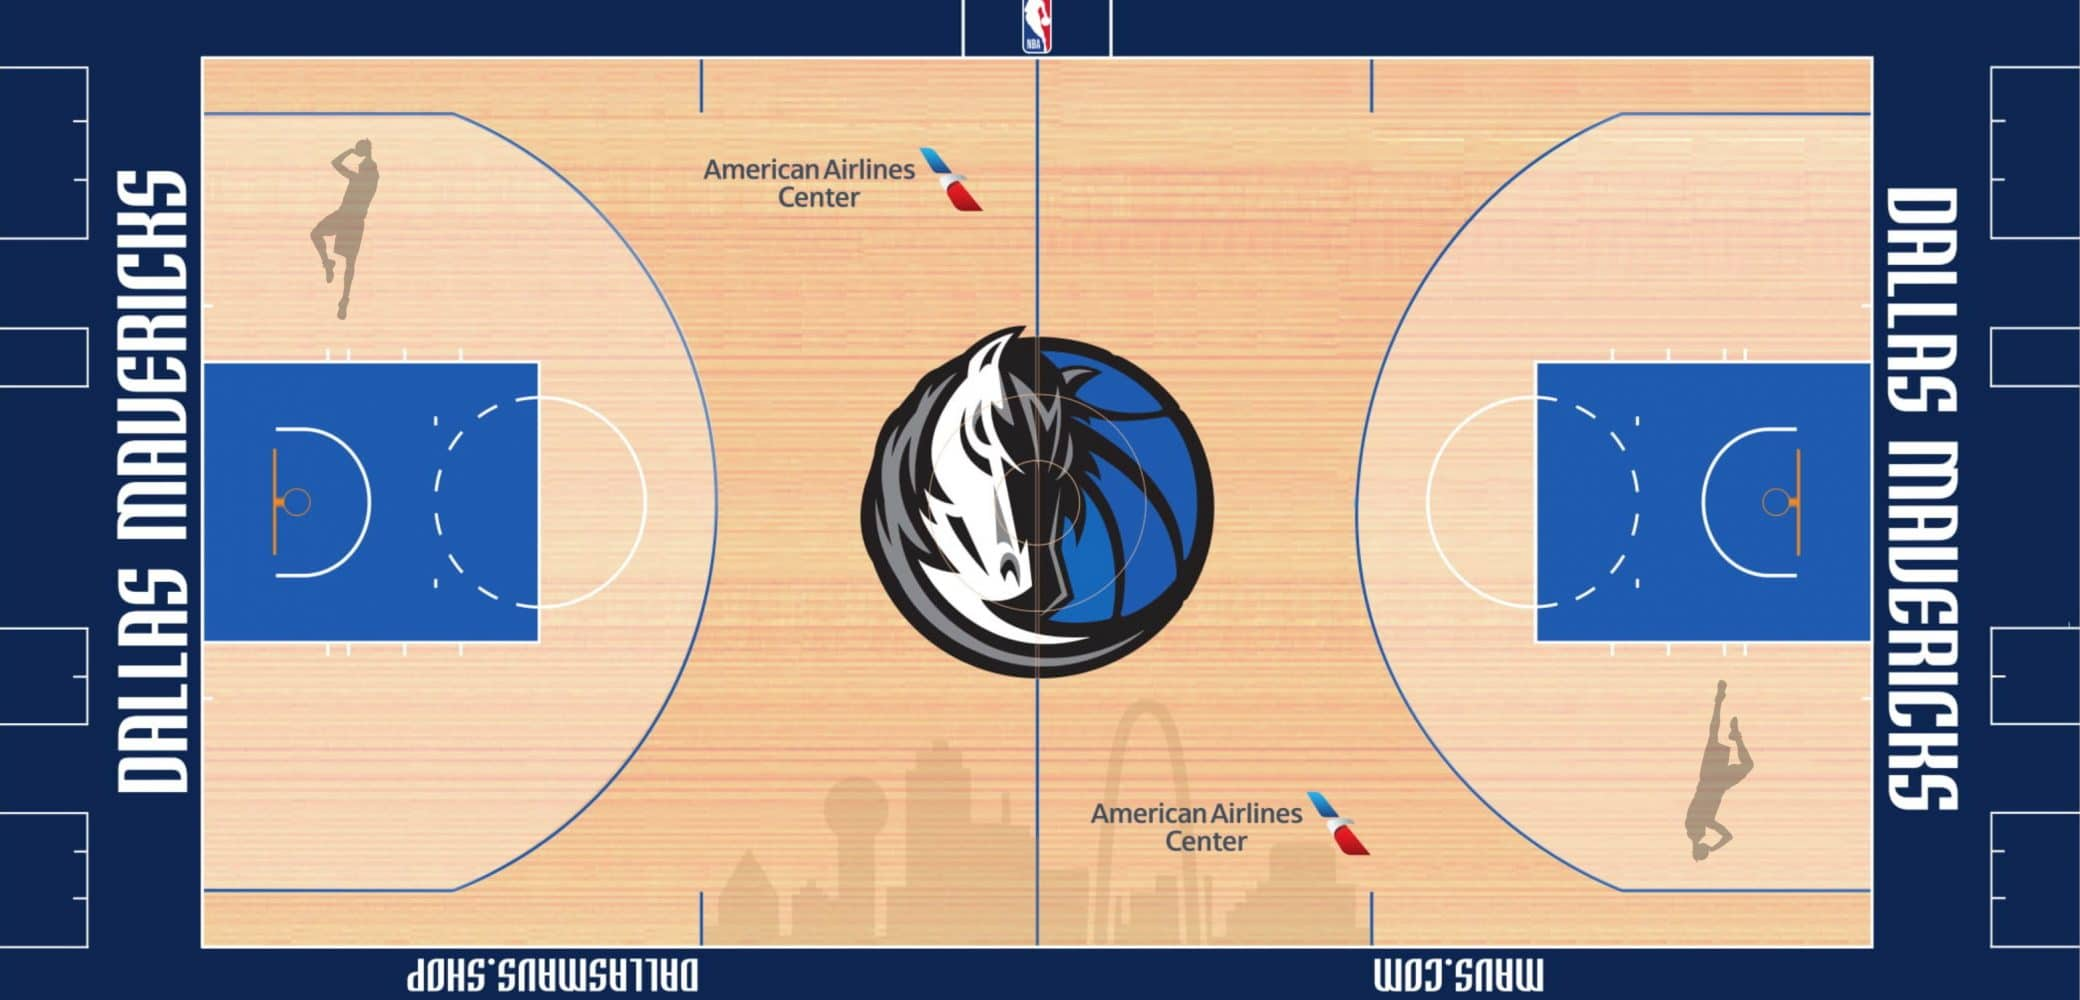 Dirk Nowitzki Dallas Mavericks court